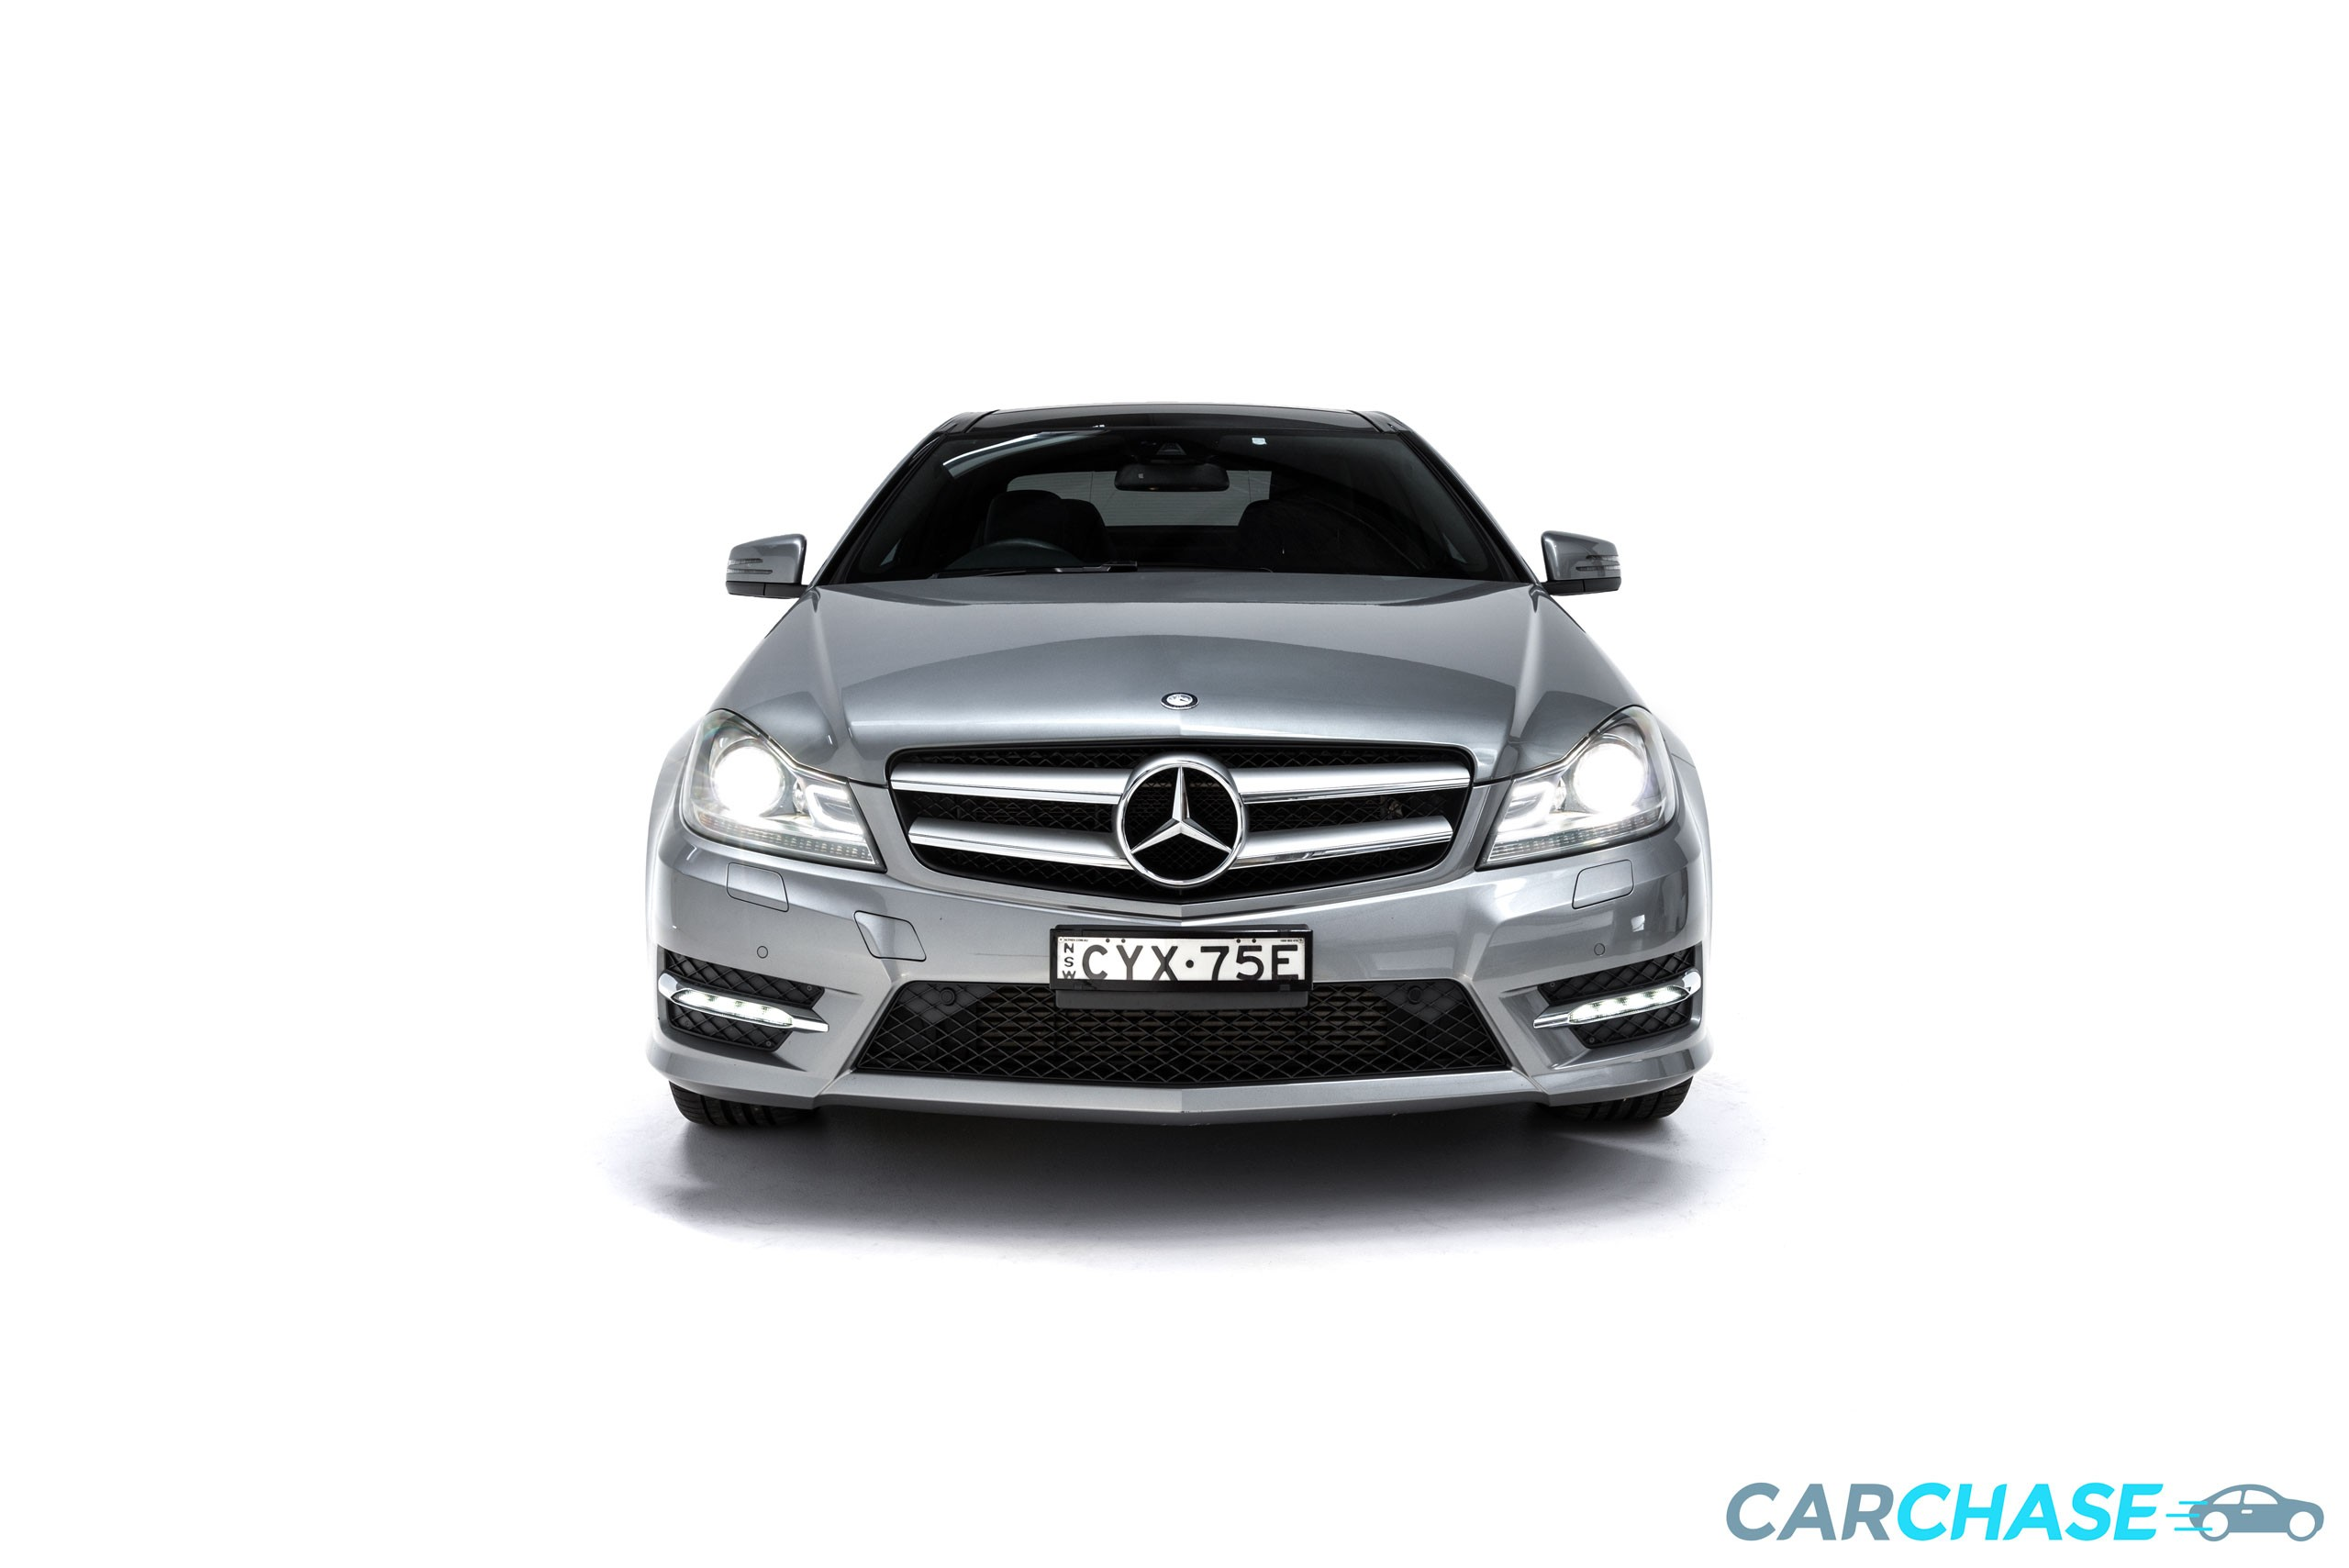 Image of front profile of 2015 Mercedes-Benz C250 CDi Avantgarde